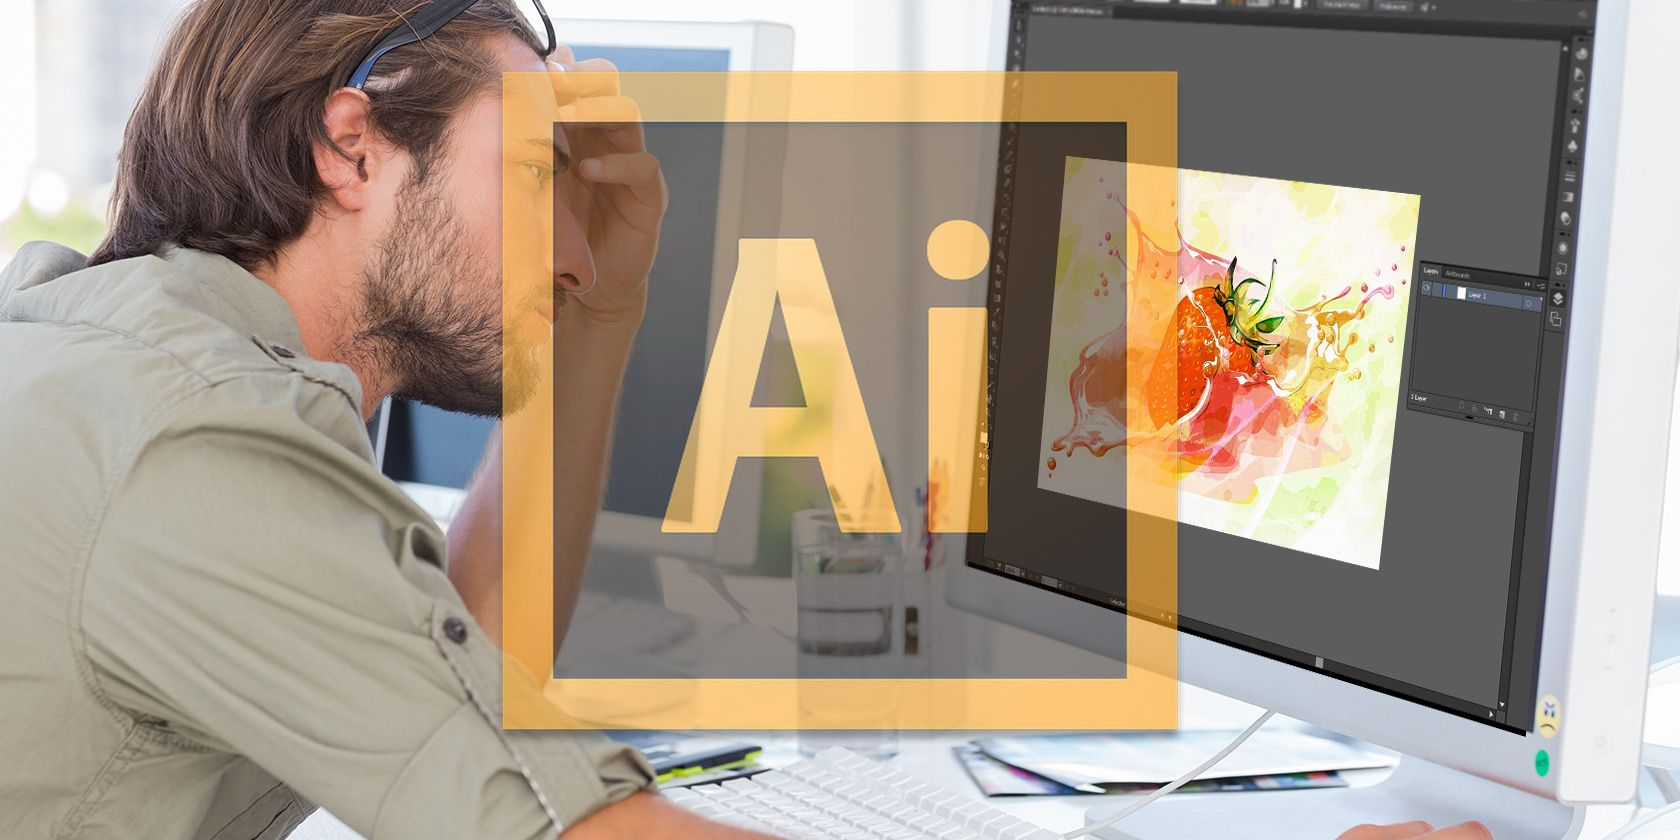 Teach Yourself Adobe Illustrator for Free